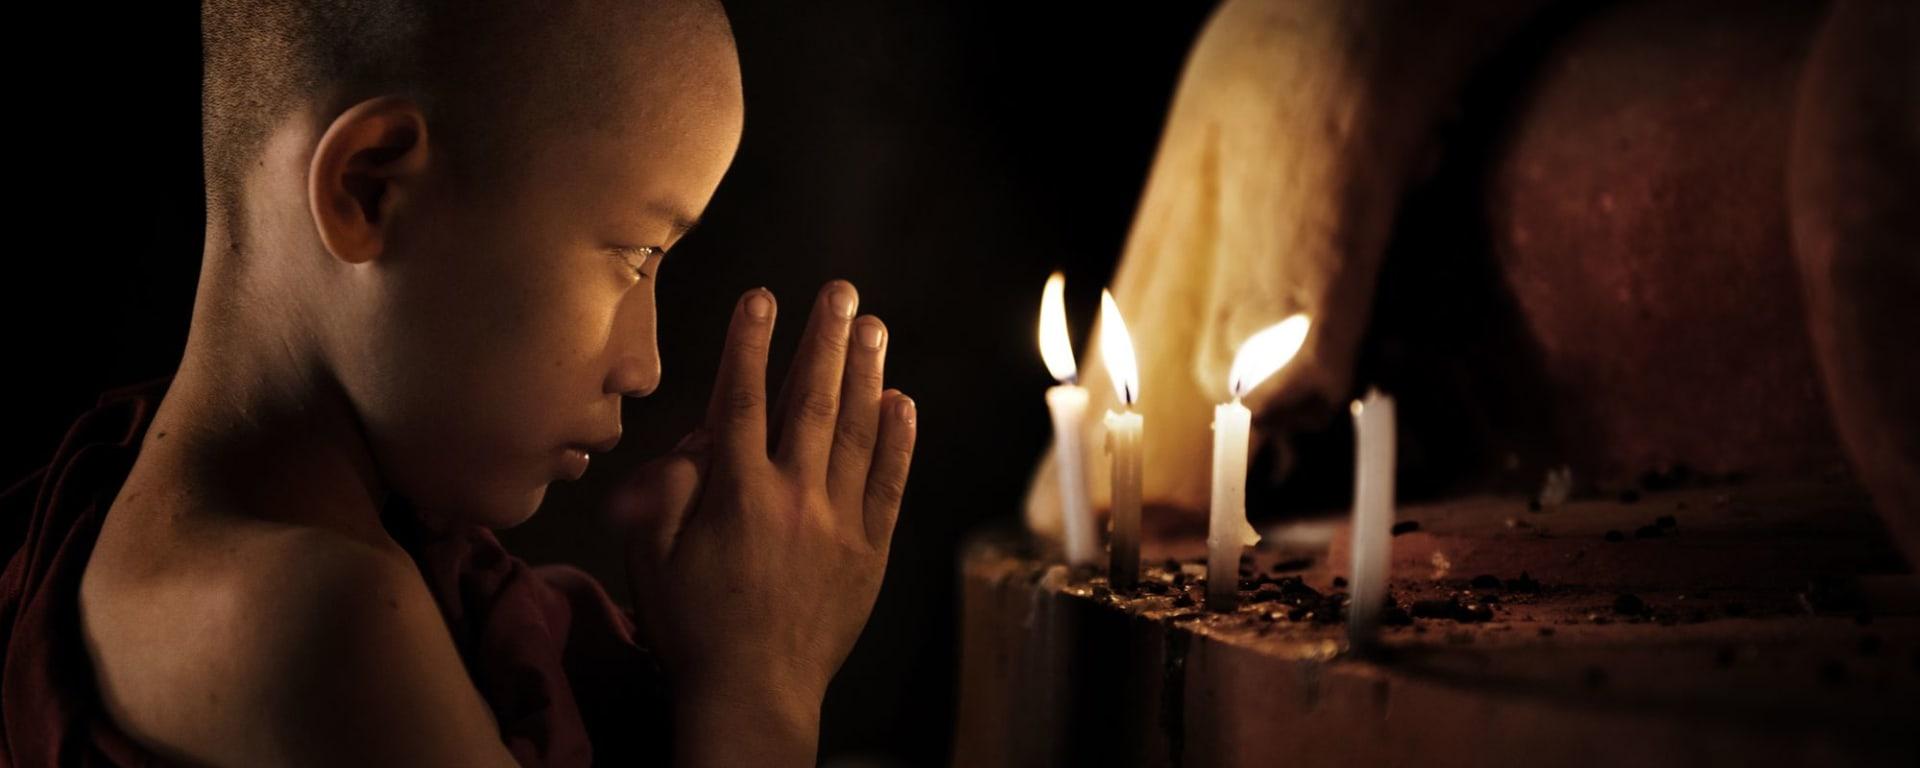 Faszination Myanmar - Ein Land im Wandel ab Naypyitaw: Bagan: young monk